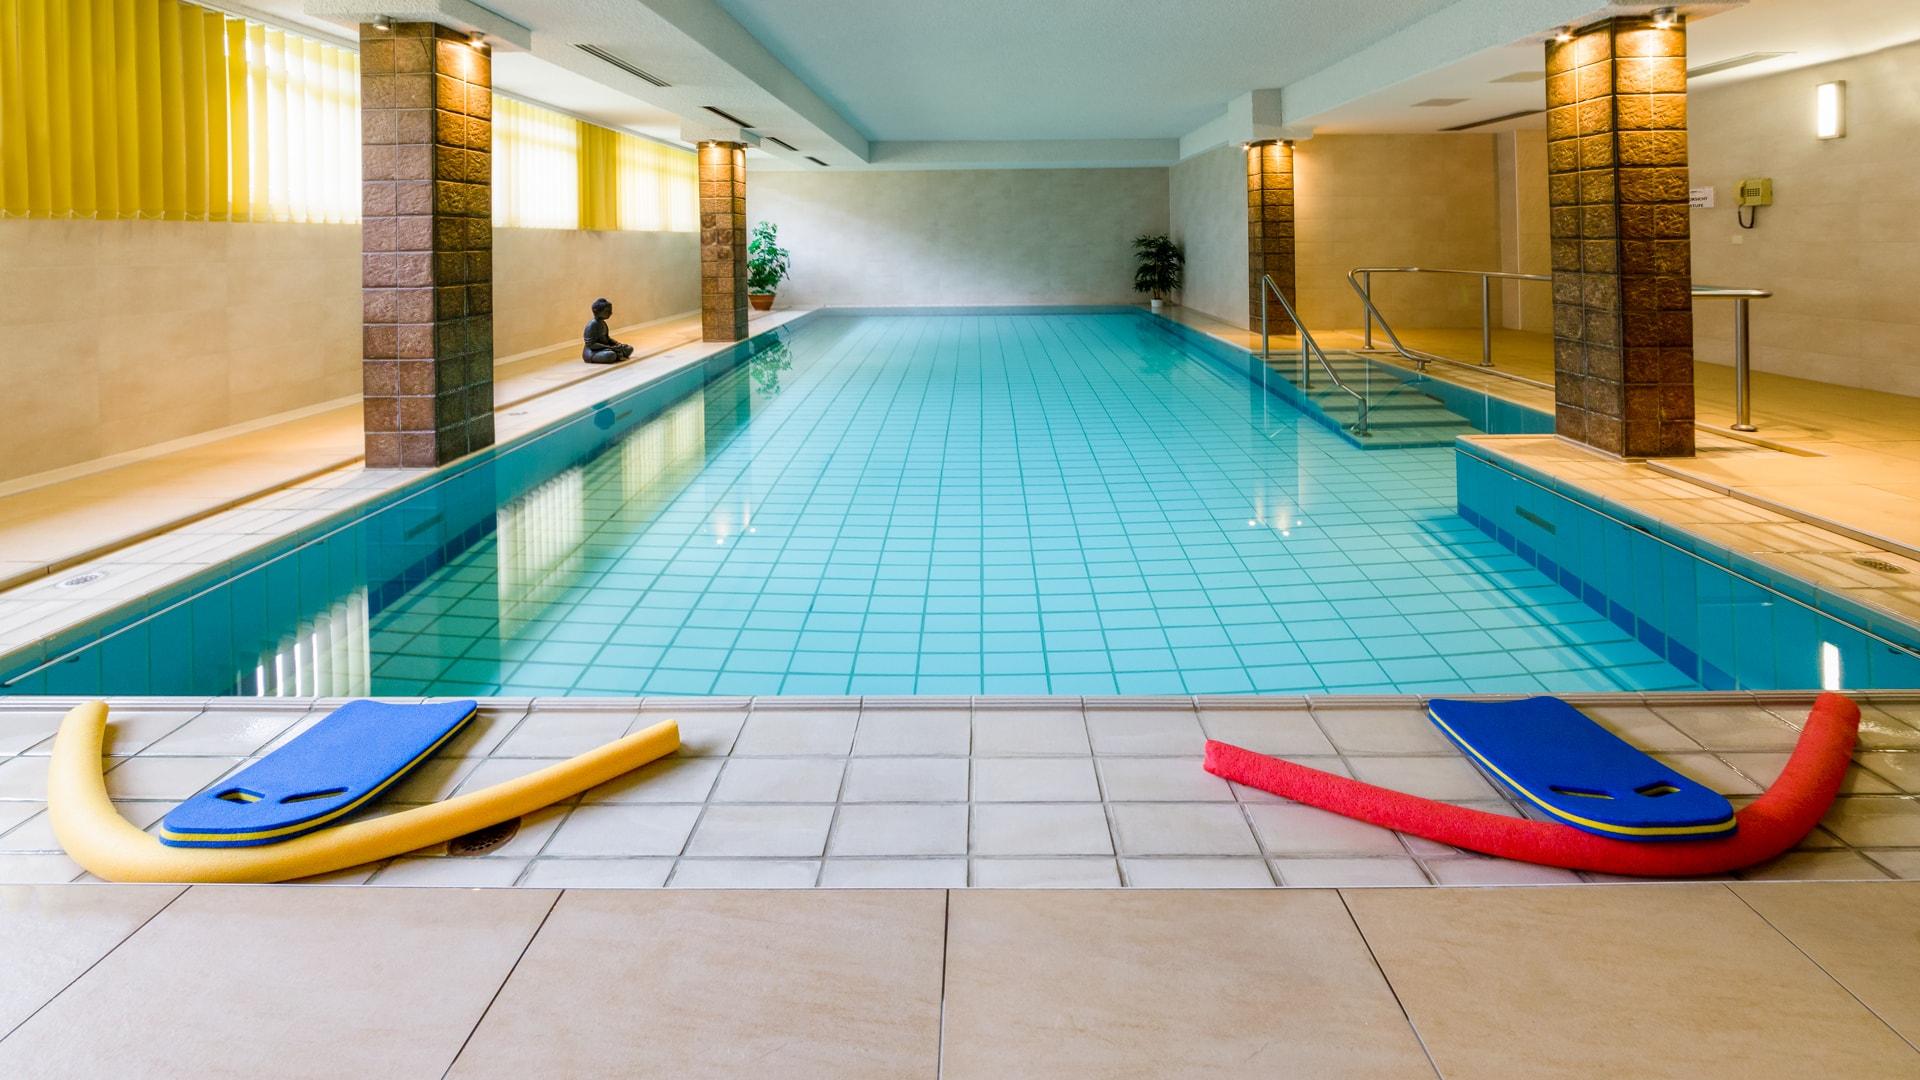 22 Michels_Hotels_Hotel_Hanseatic_Wellnessbereich_Pool